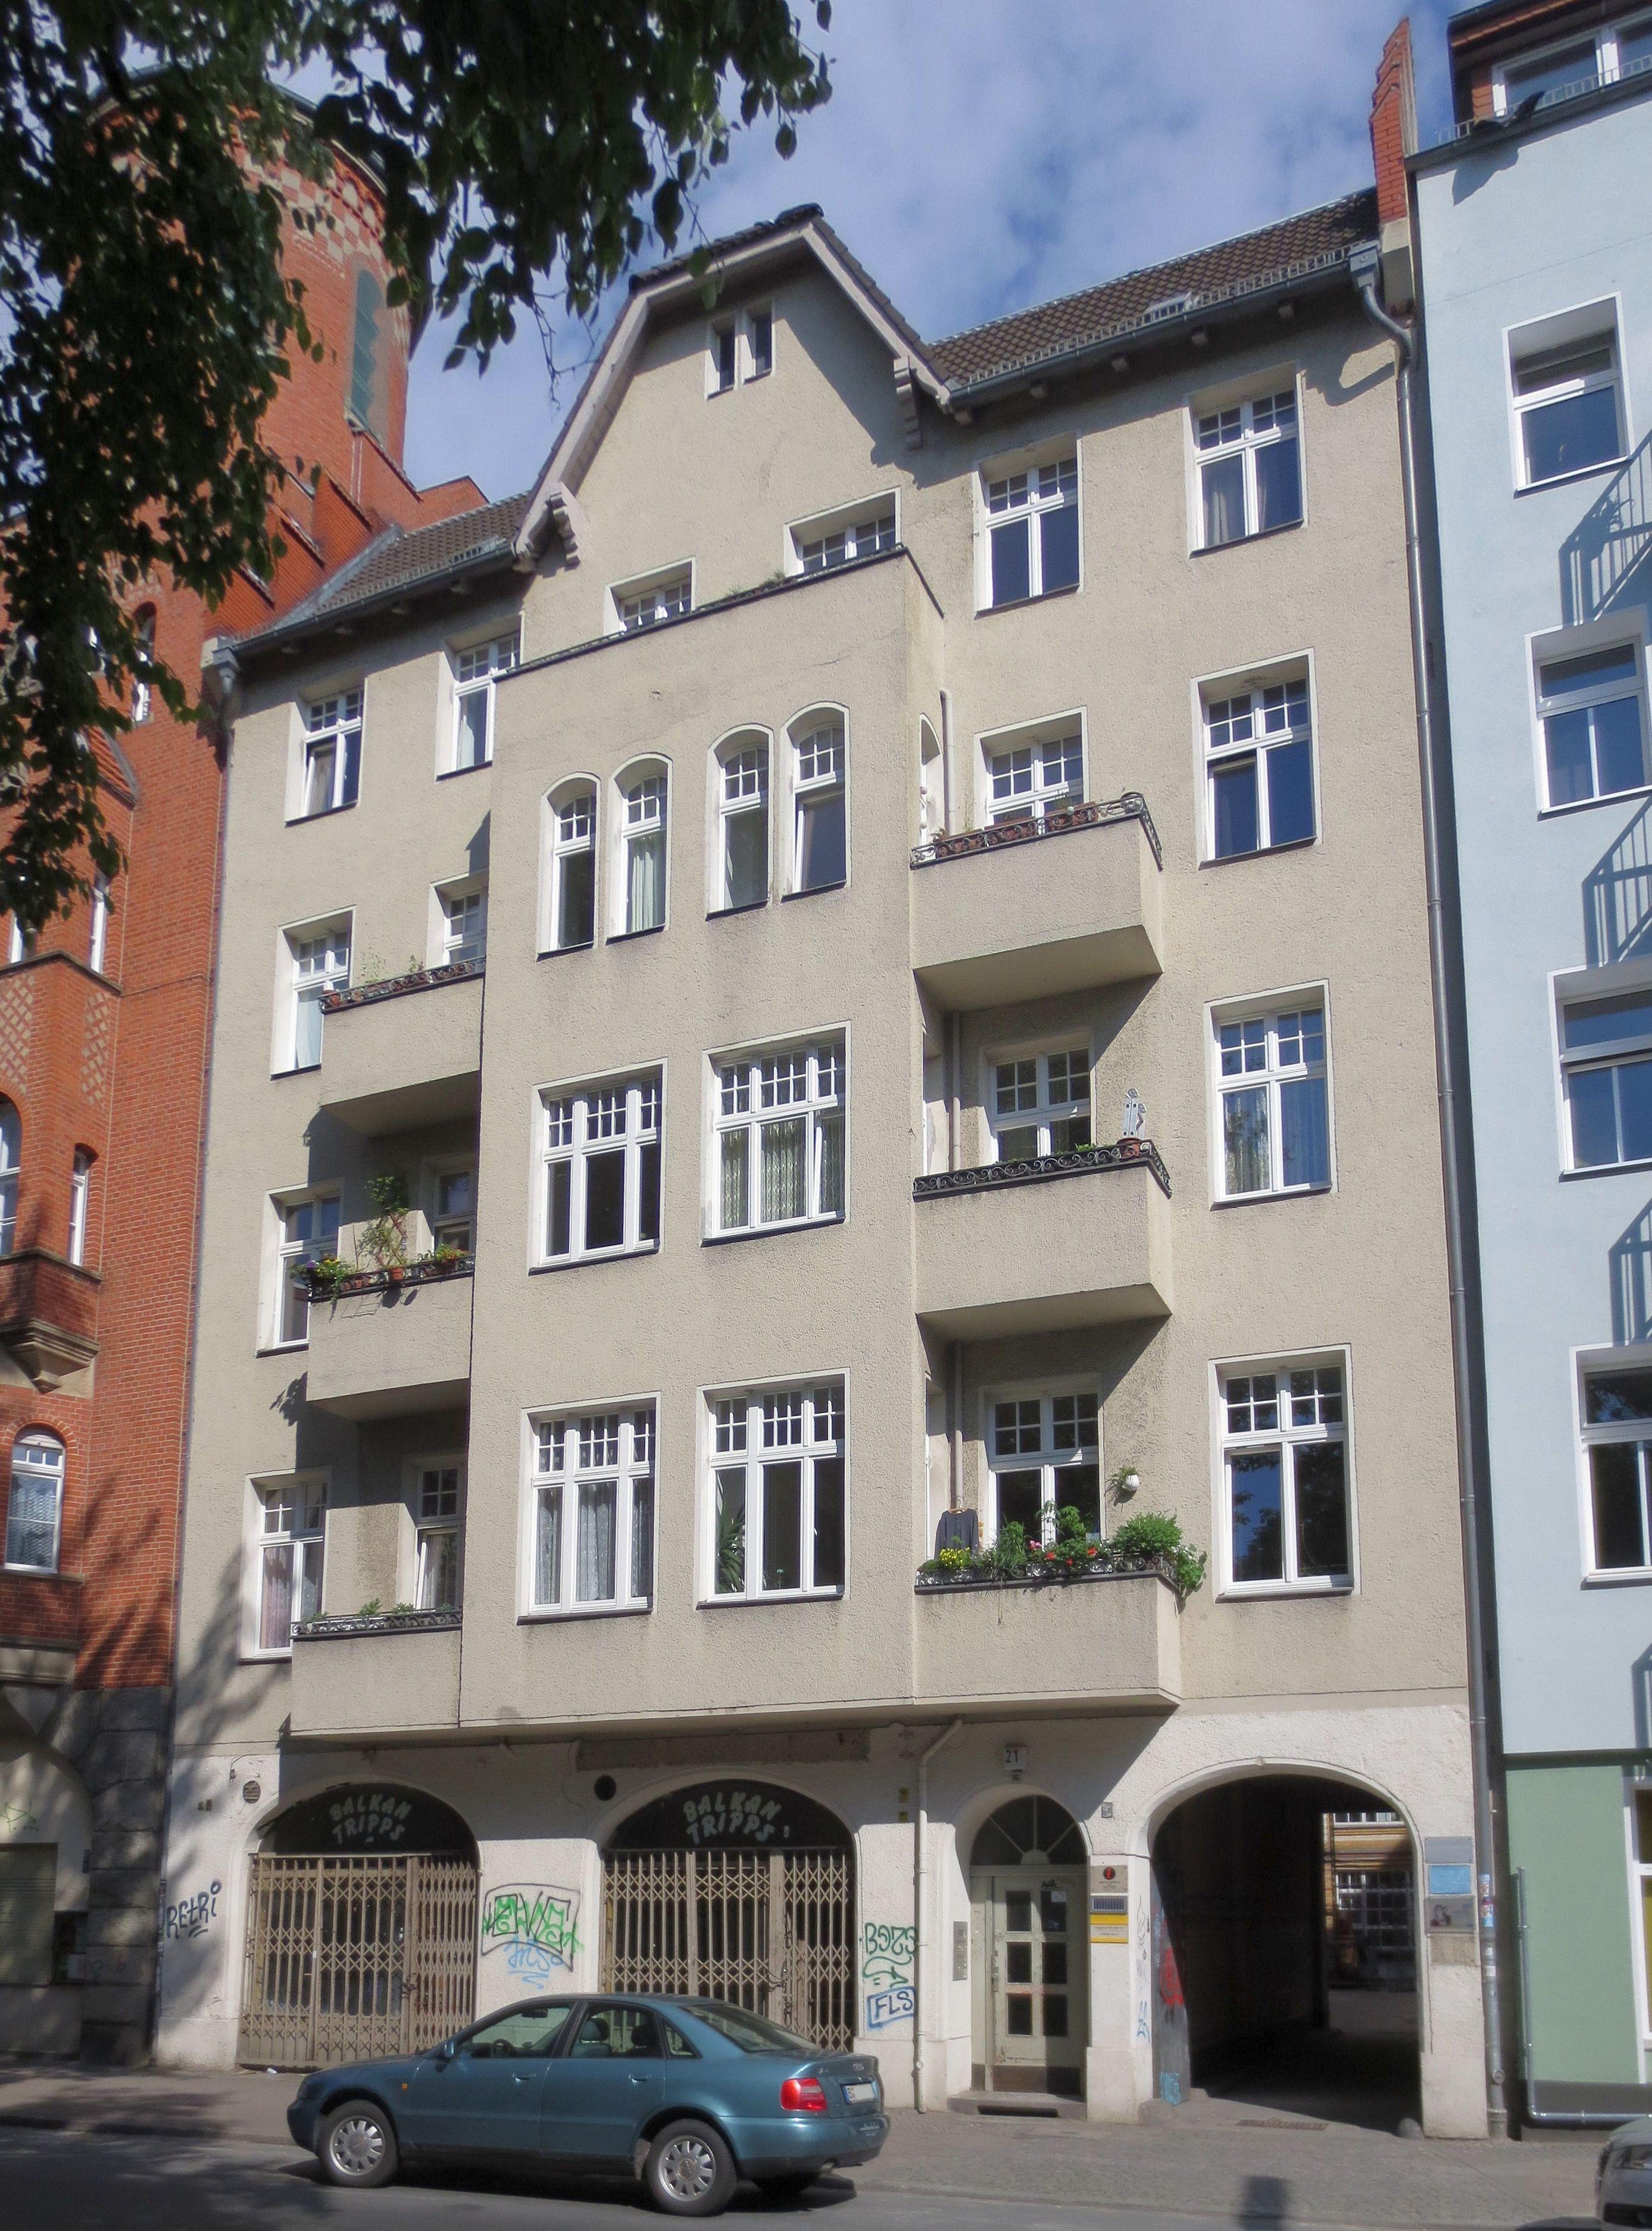 datei berlin kreuzberg glogauer strasse 21 mietshaus mit wikipedia. Black Bedroom Furniture Sets. Home Design Ideas